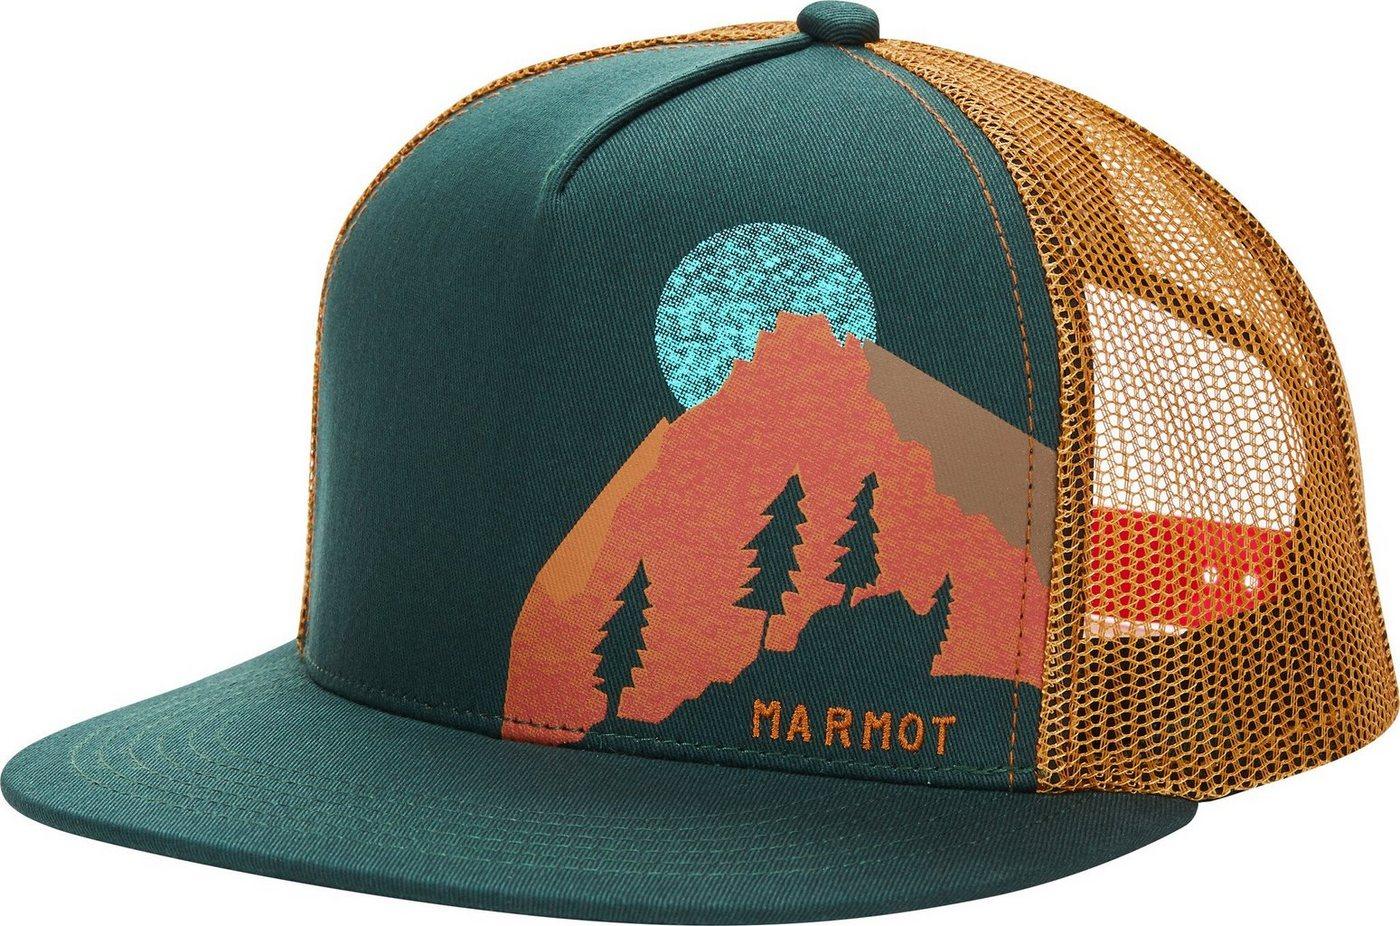 marmot -  Hut »Trucker Cap«